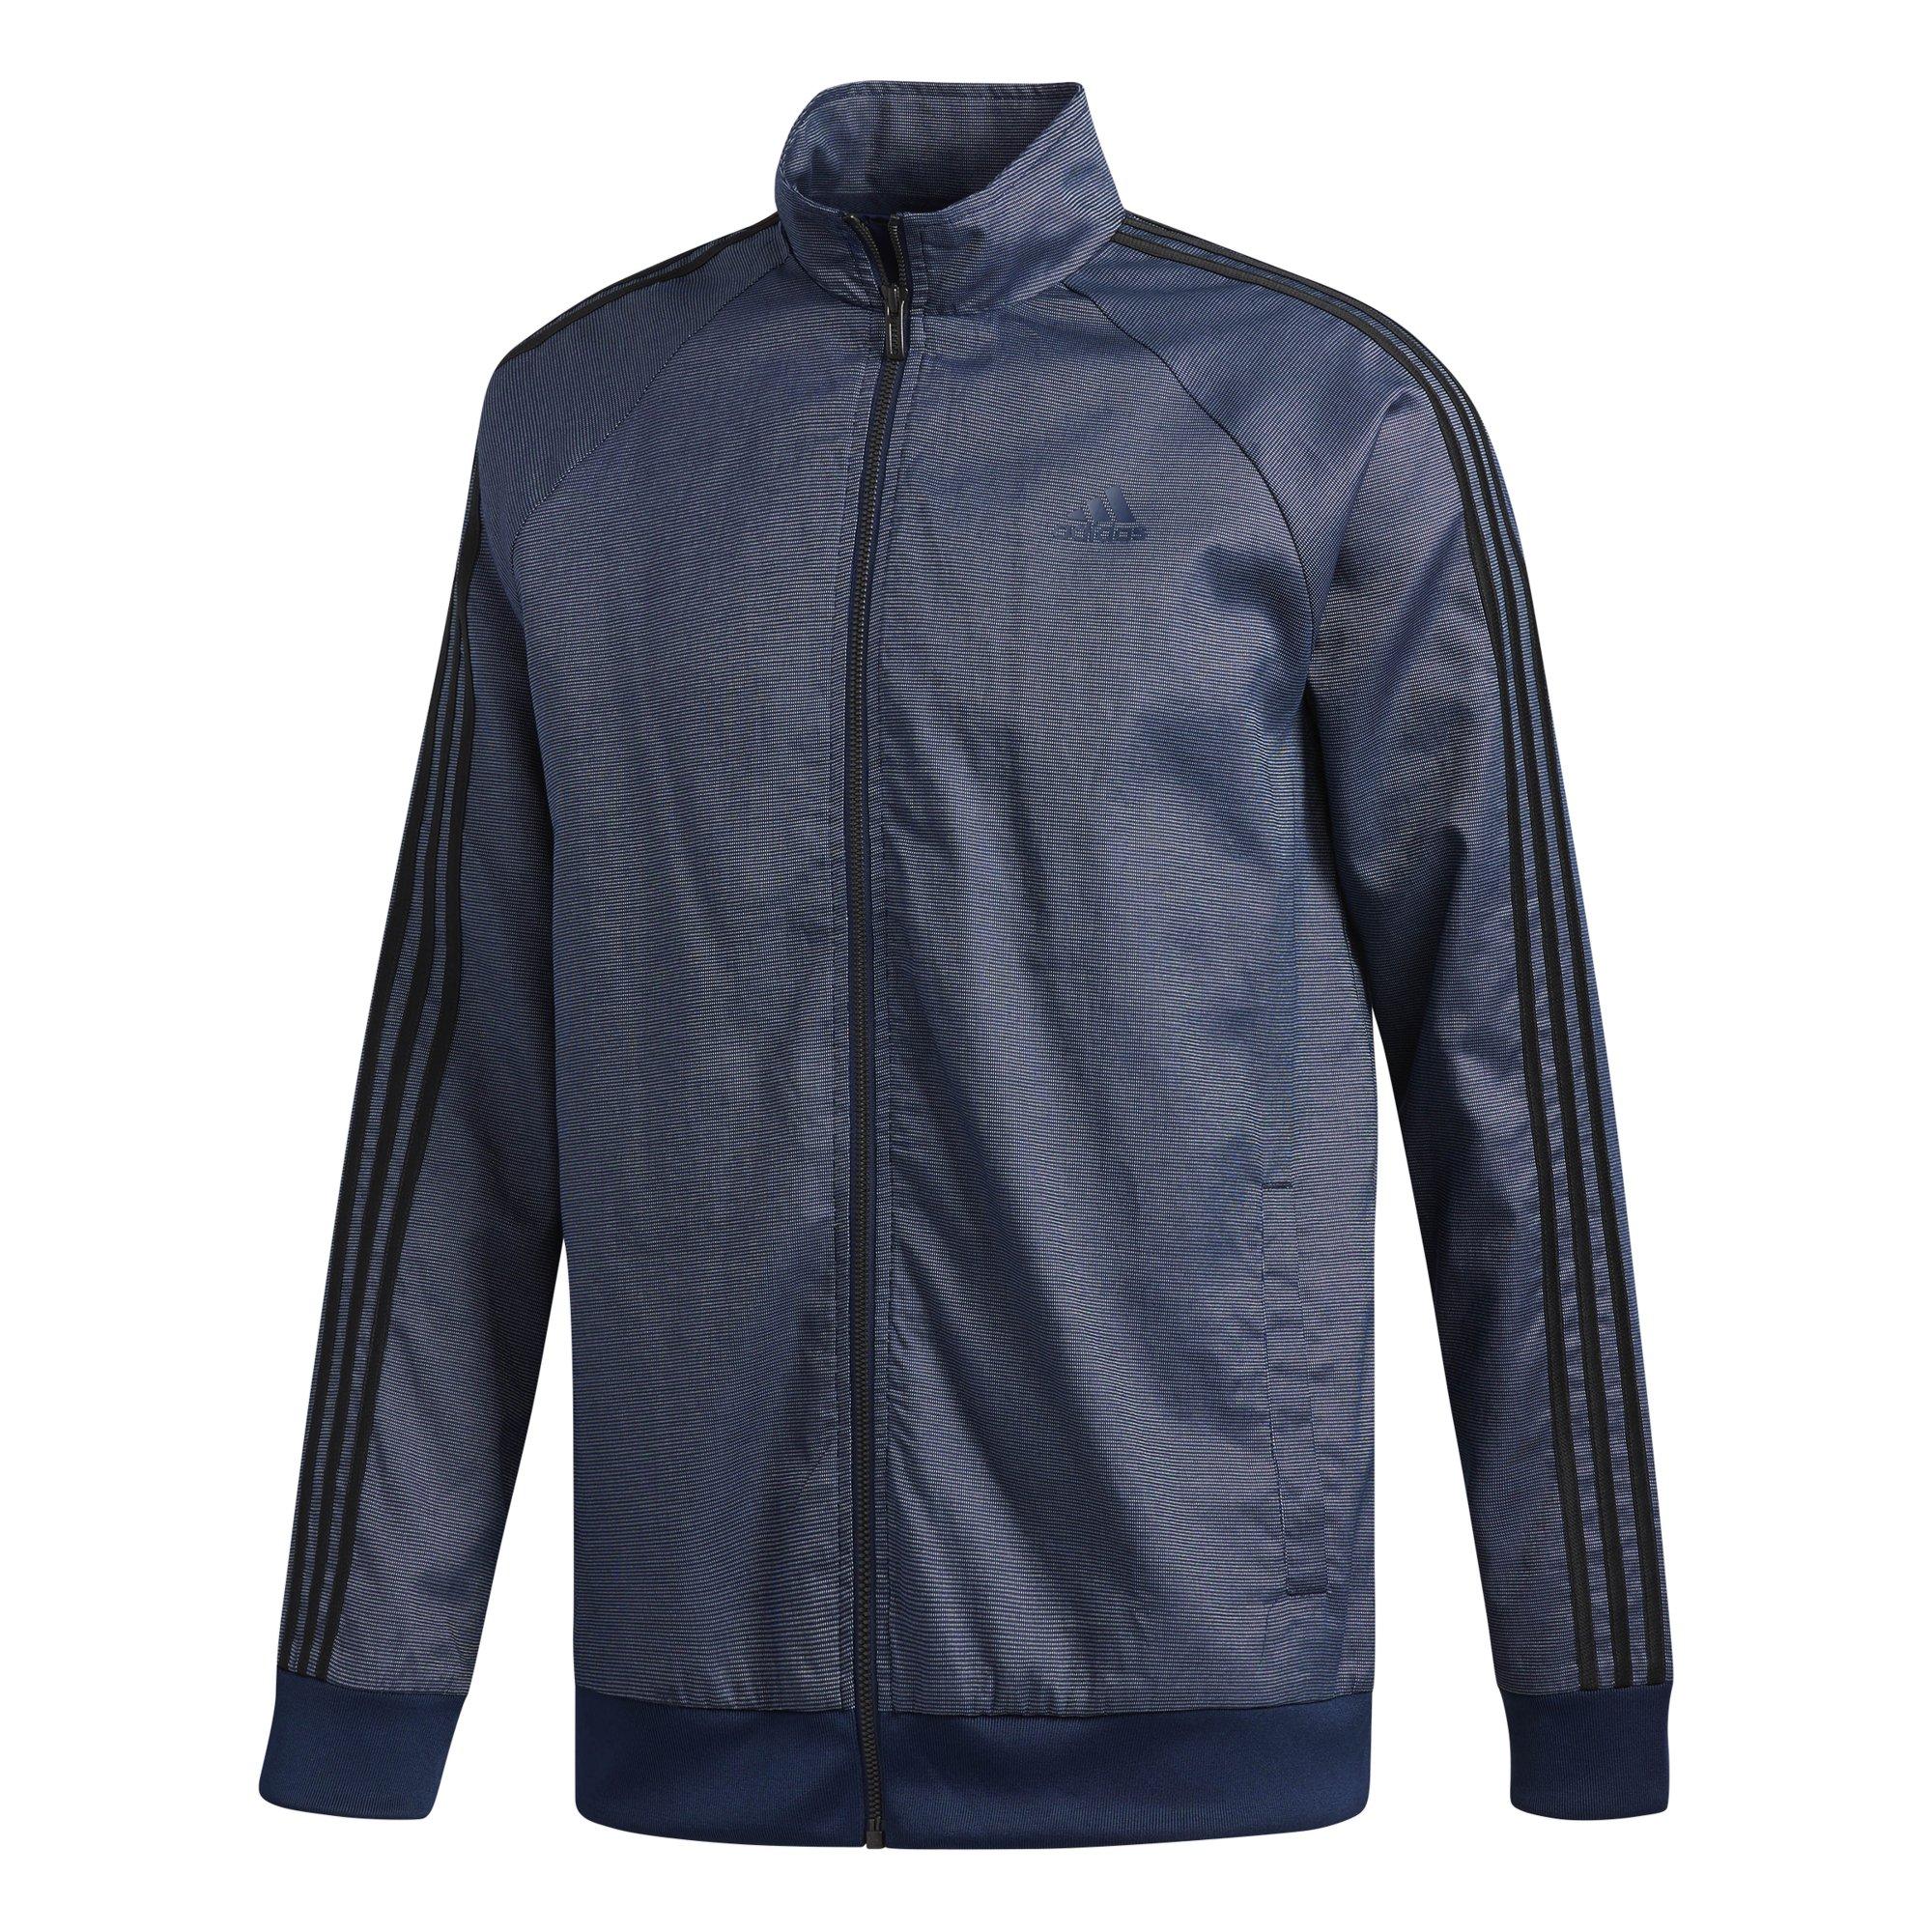 961d2cad91f99 adidas Men's Essentials 3-Stripe Woven Track Top Collegiate Navy/Black  XX-Large